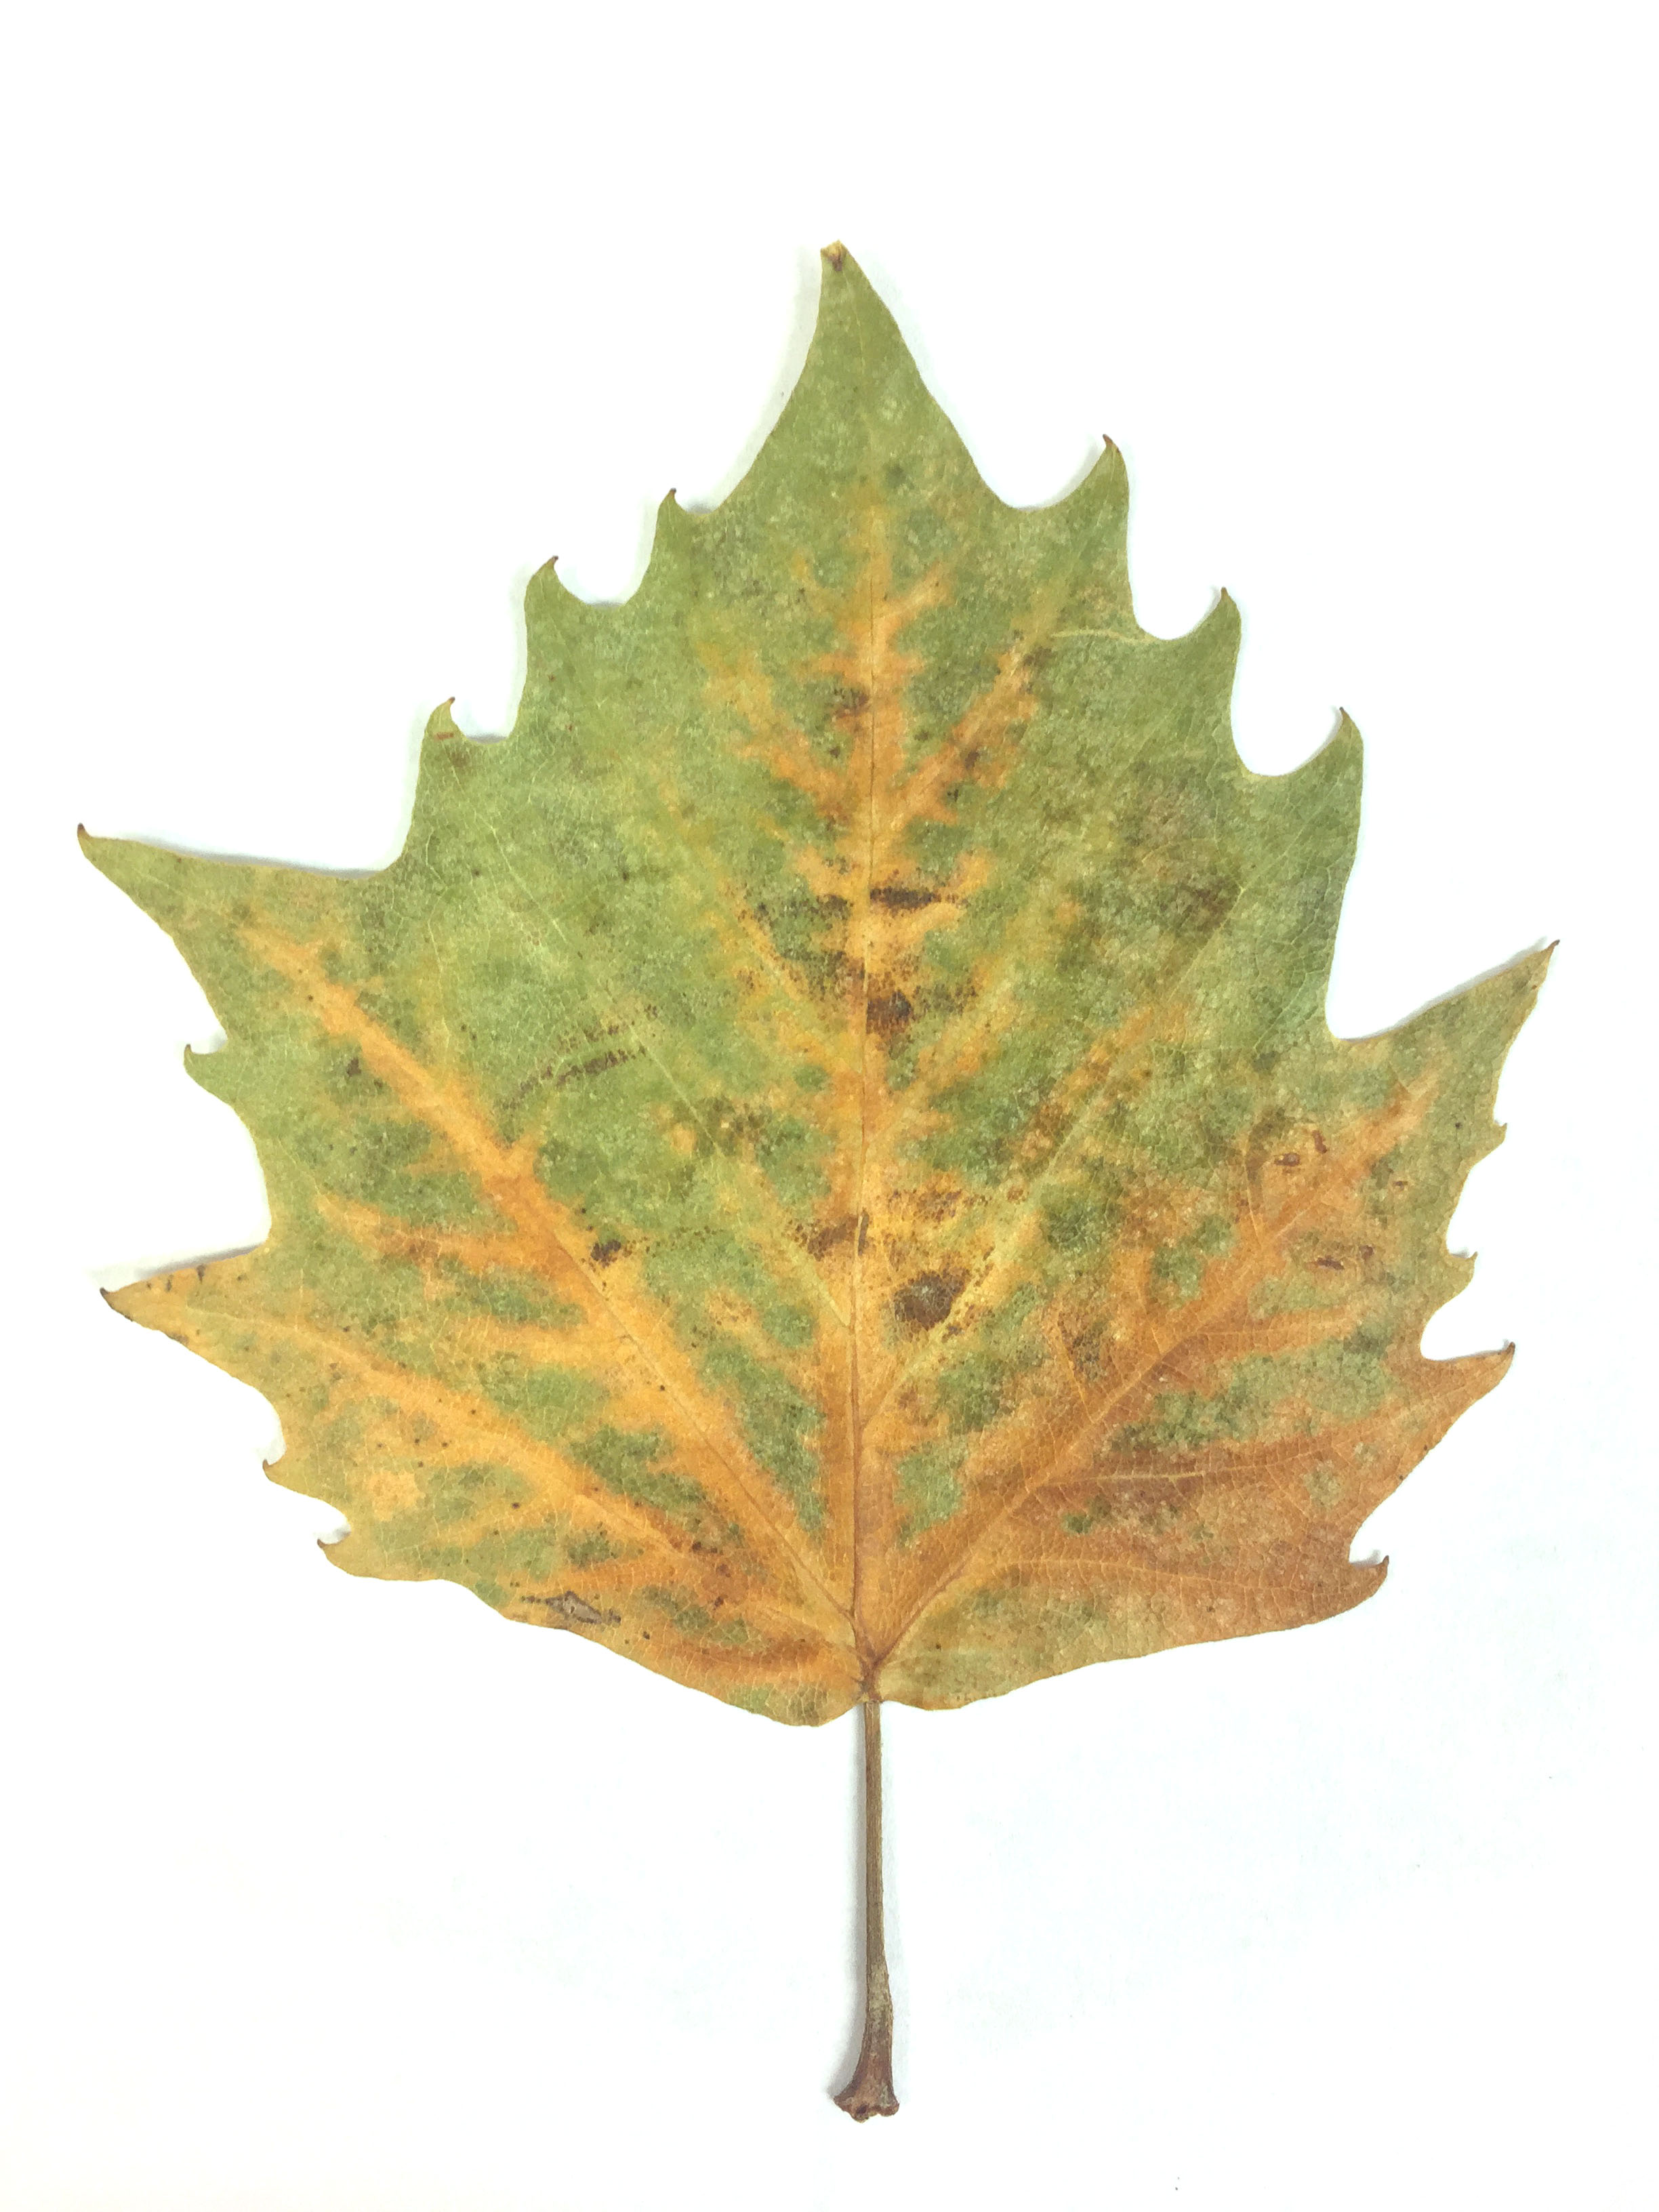 The original Plane tree leaf!